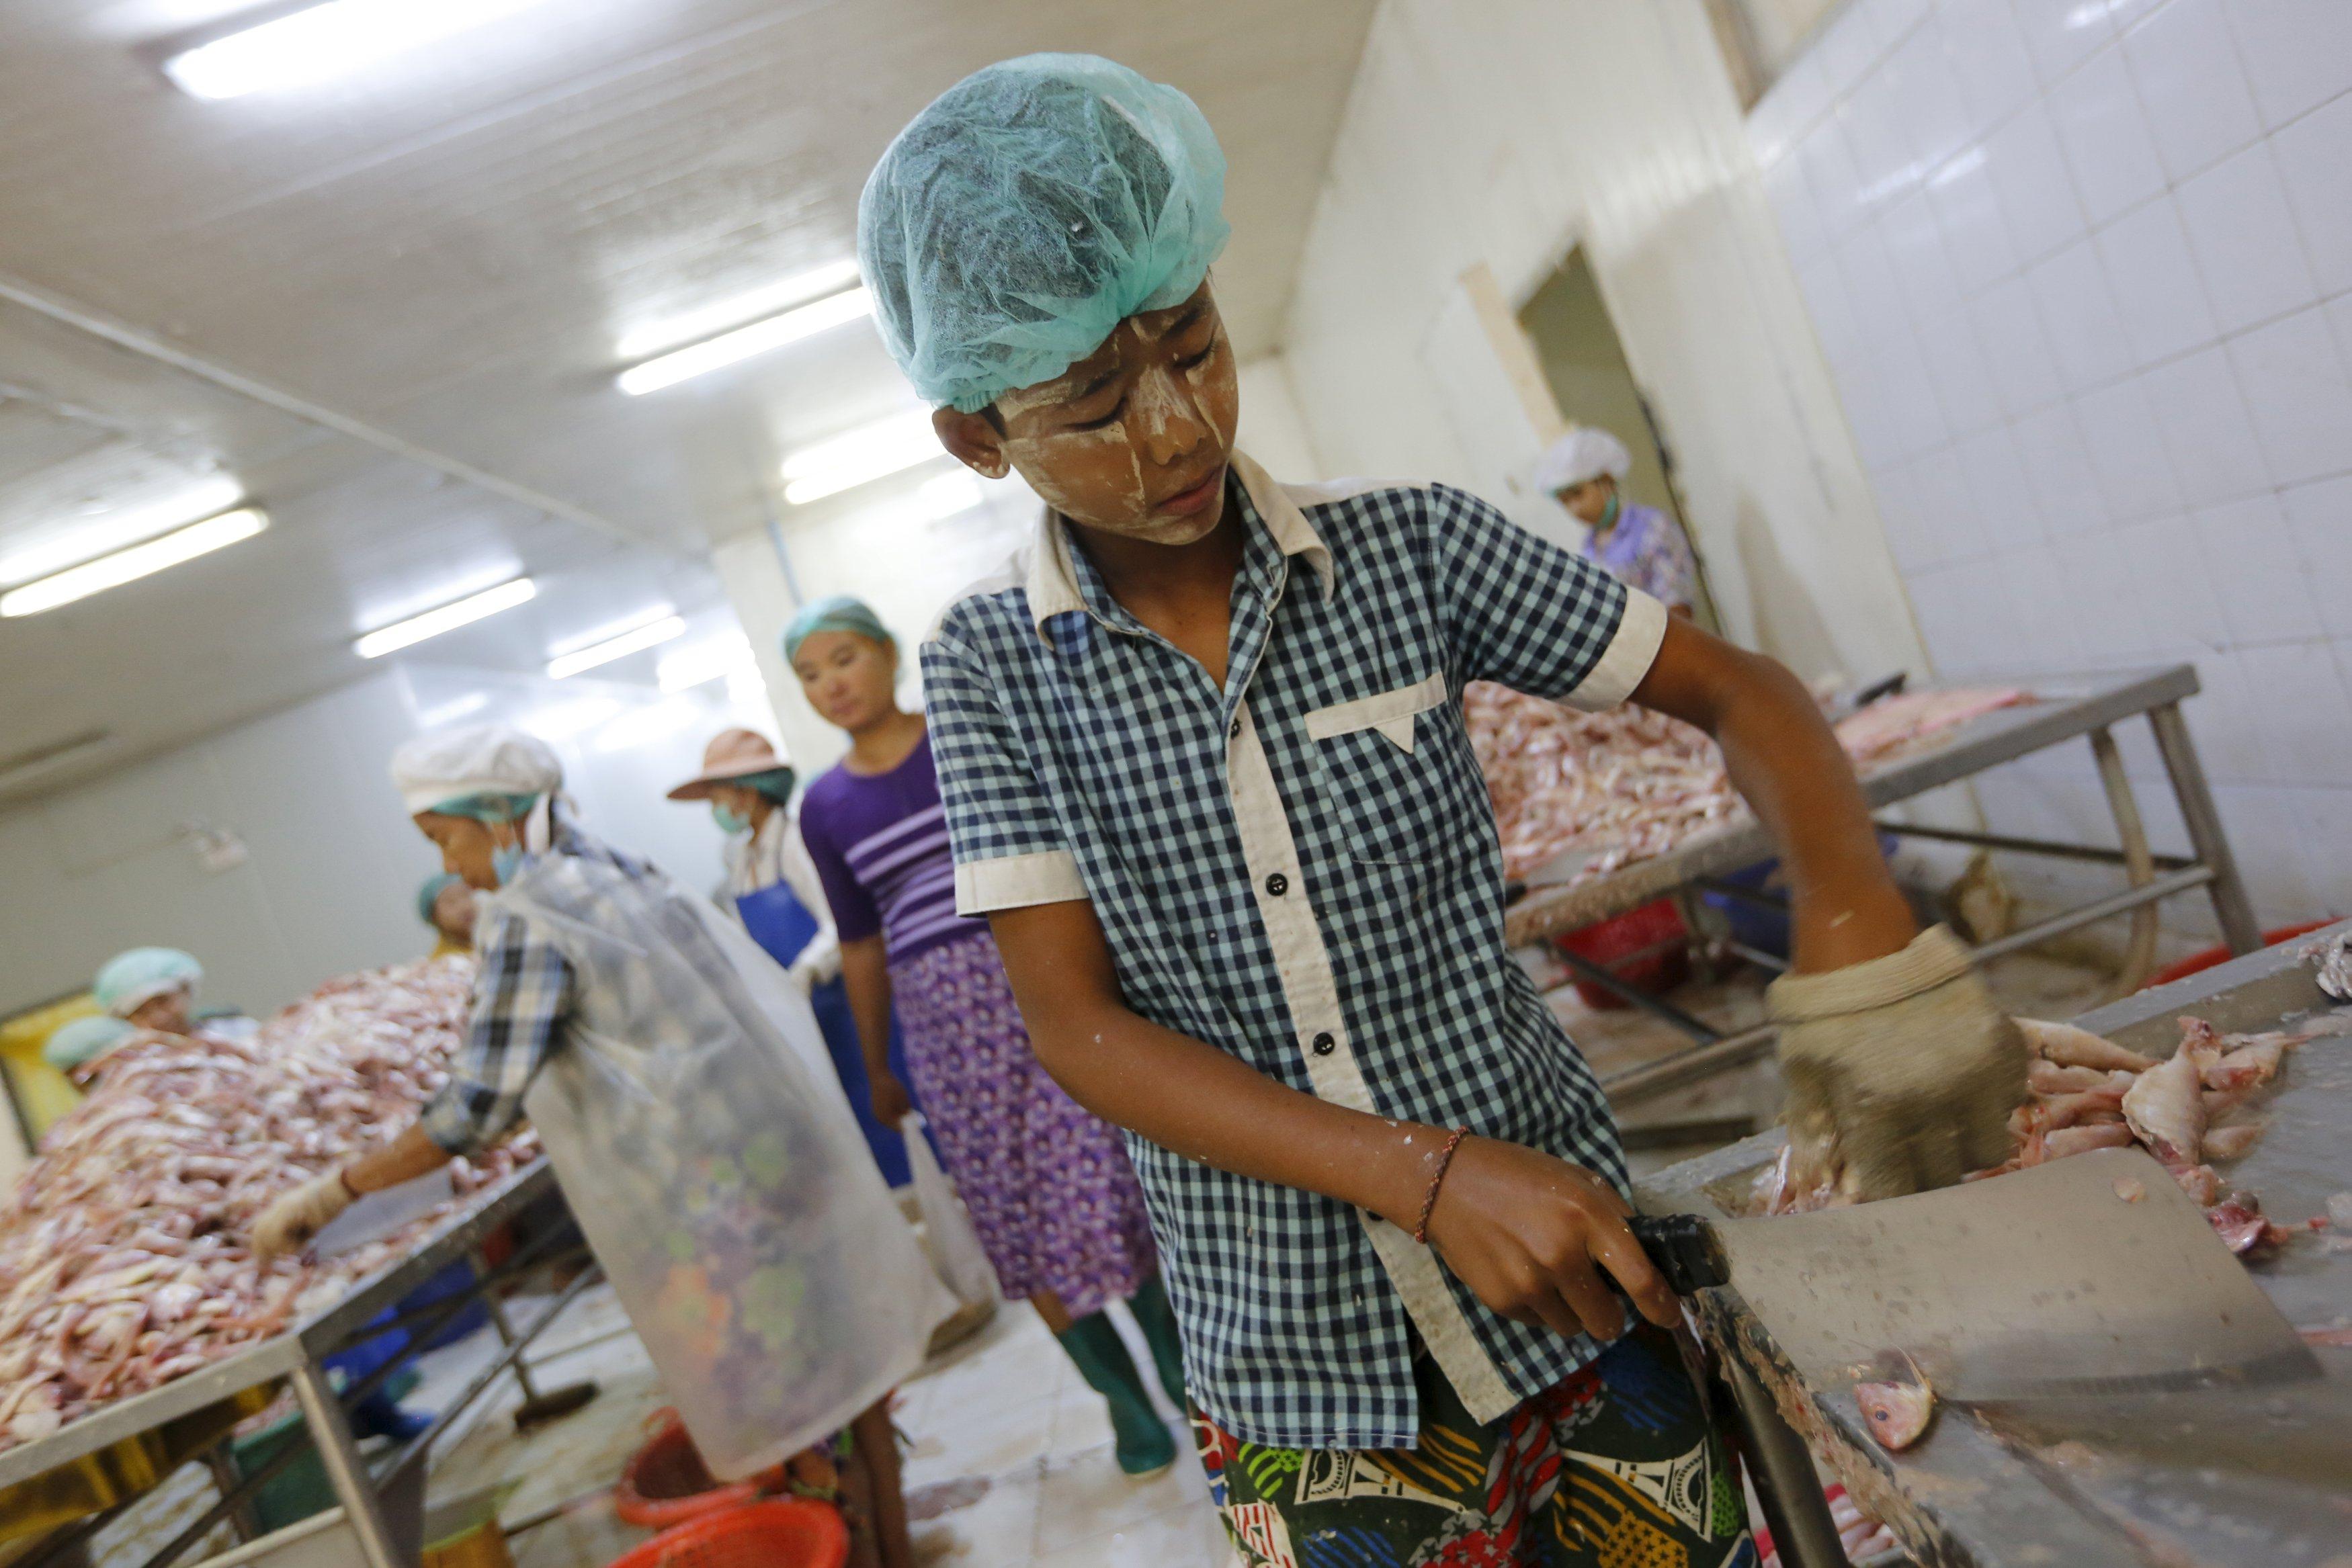 As economy booms, children toil in Myanmar